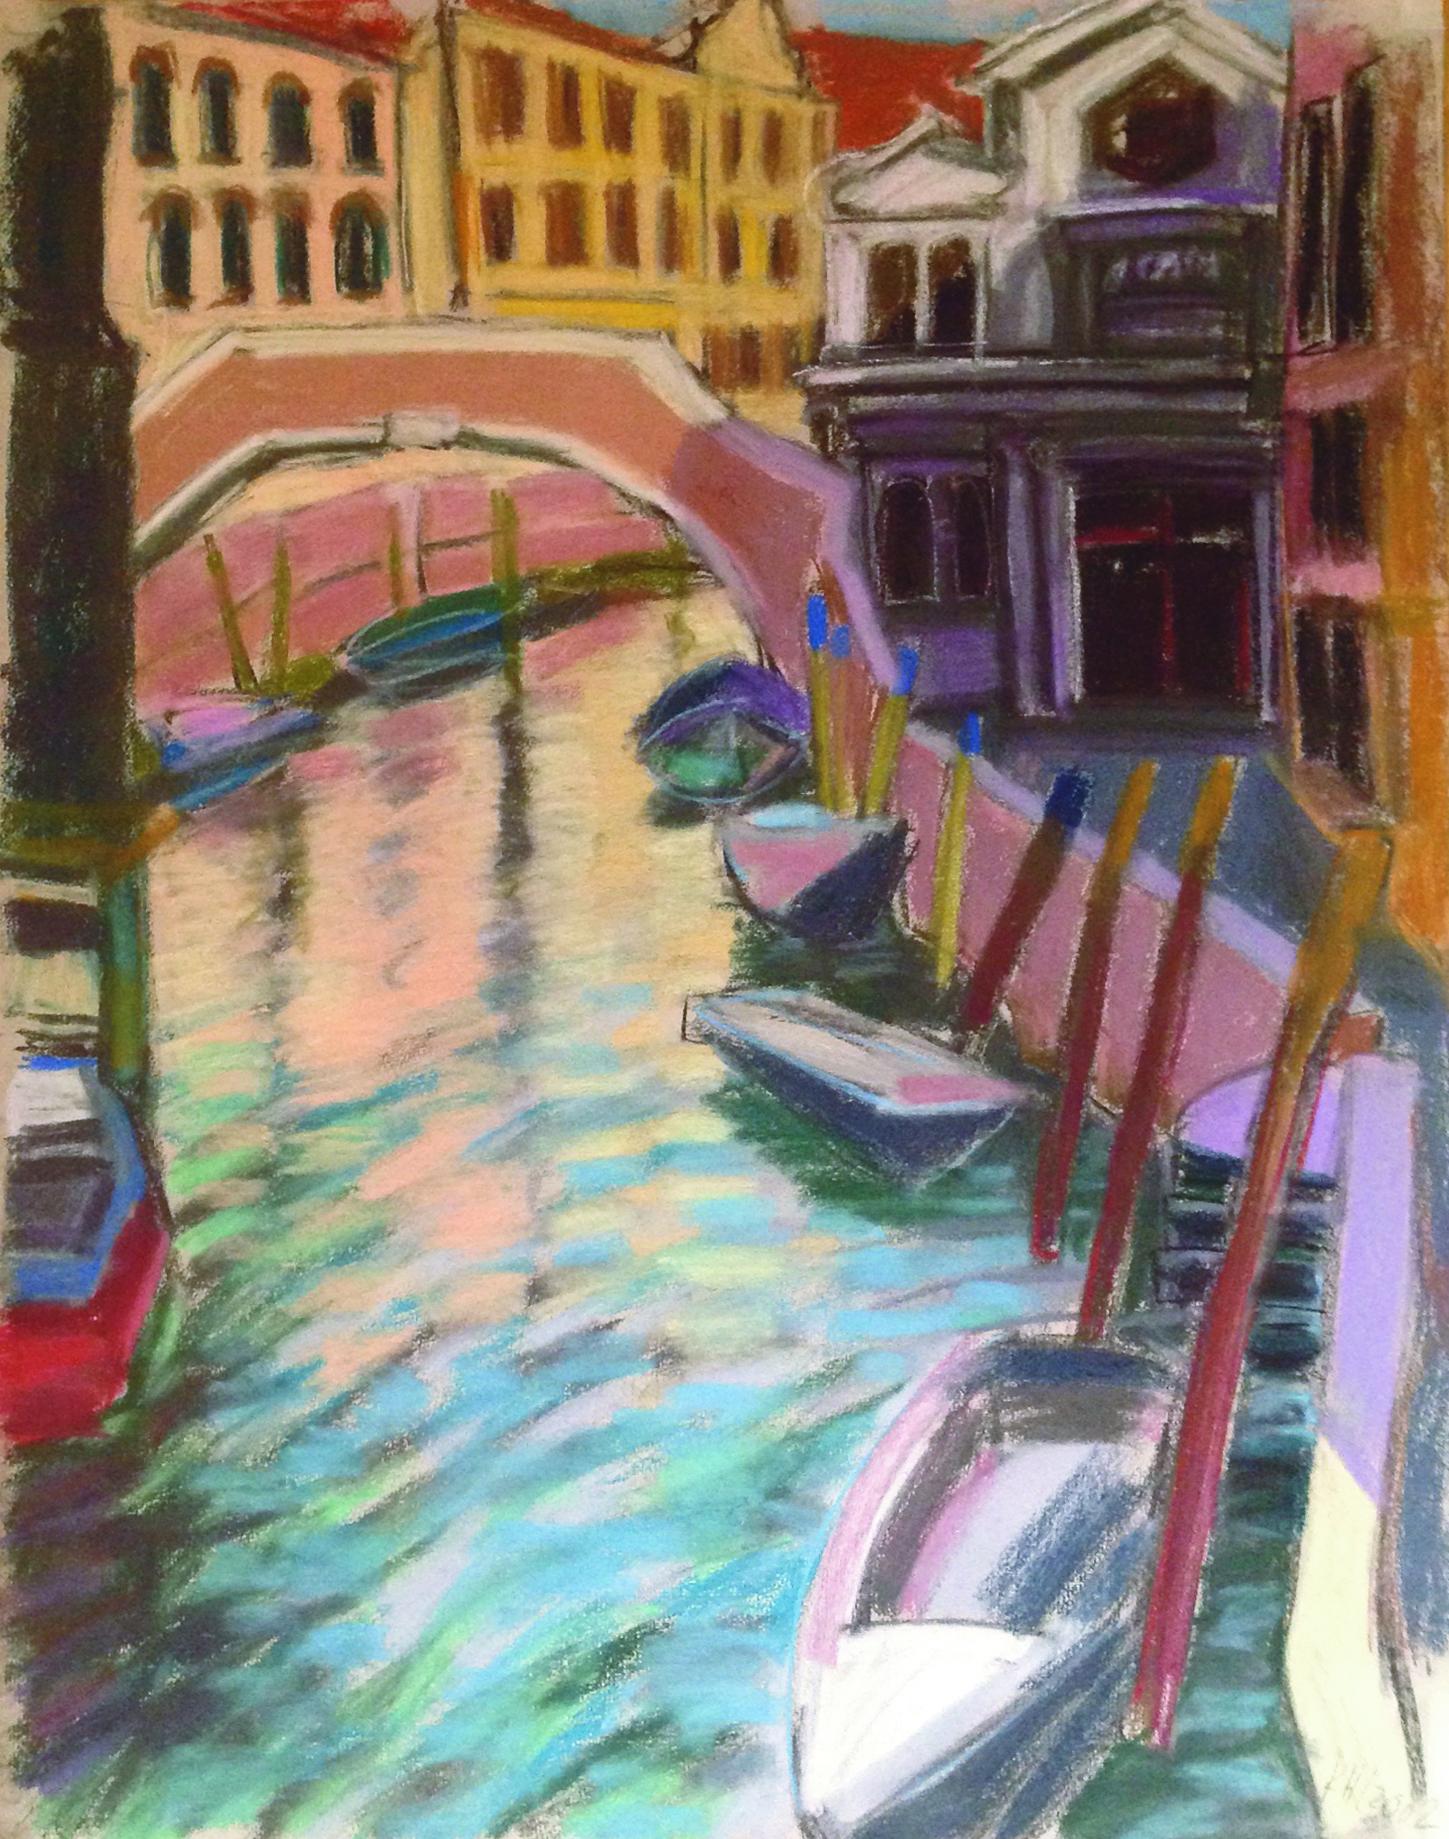 Venedig, Boote am Kanal(c)kheymach